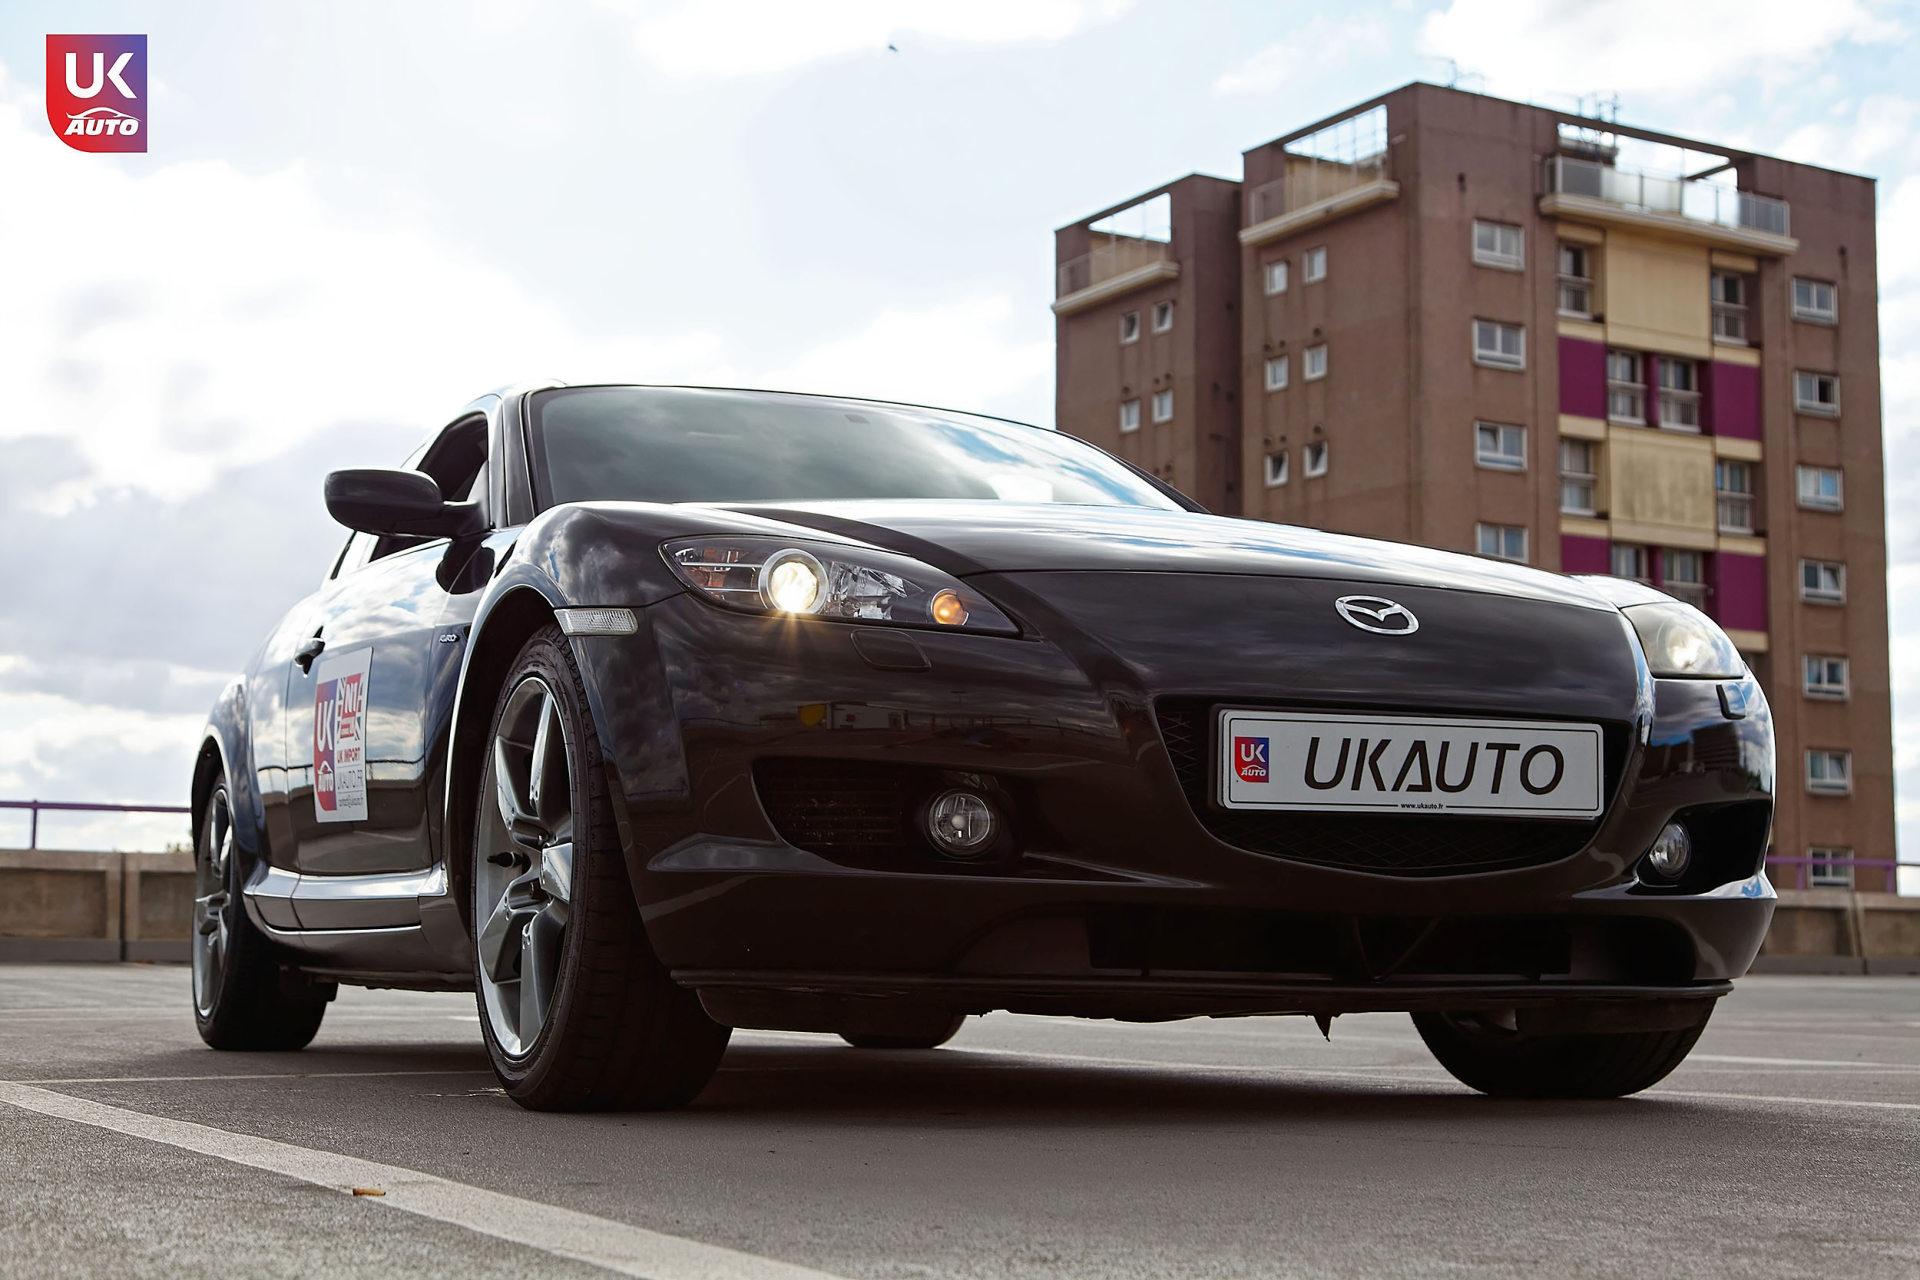 Mazda RX8 Rotary mazda angleterre mazda uk RX8 KURO import uk rhd10 DxO - Import Mazda RX8 KURO ROTARY depuis Autotrader par UKAUTO site annonces UK rhd Felicitation a Dimitri